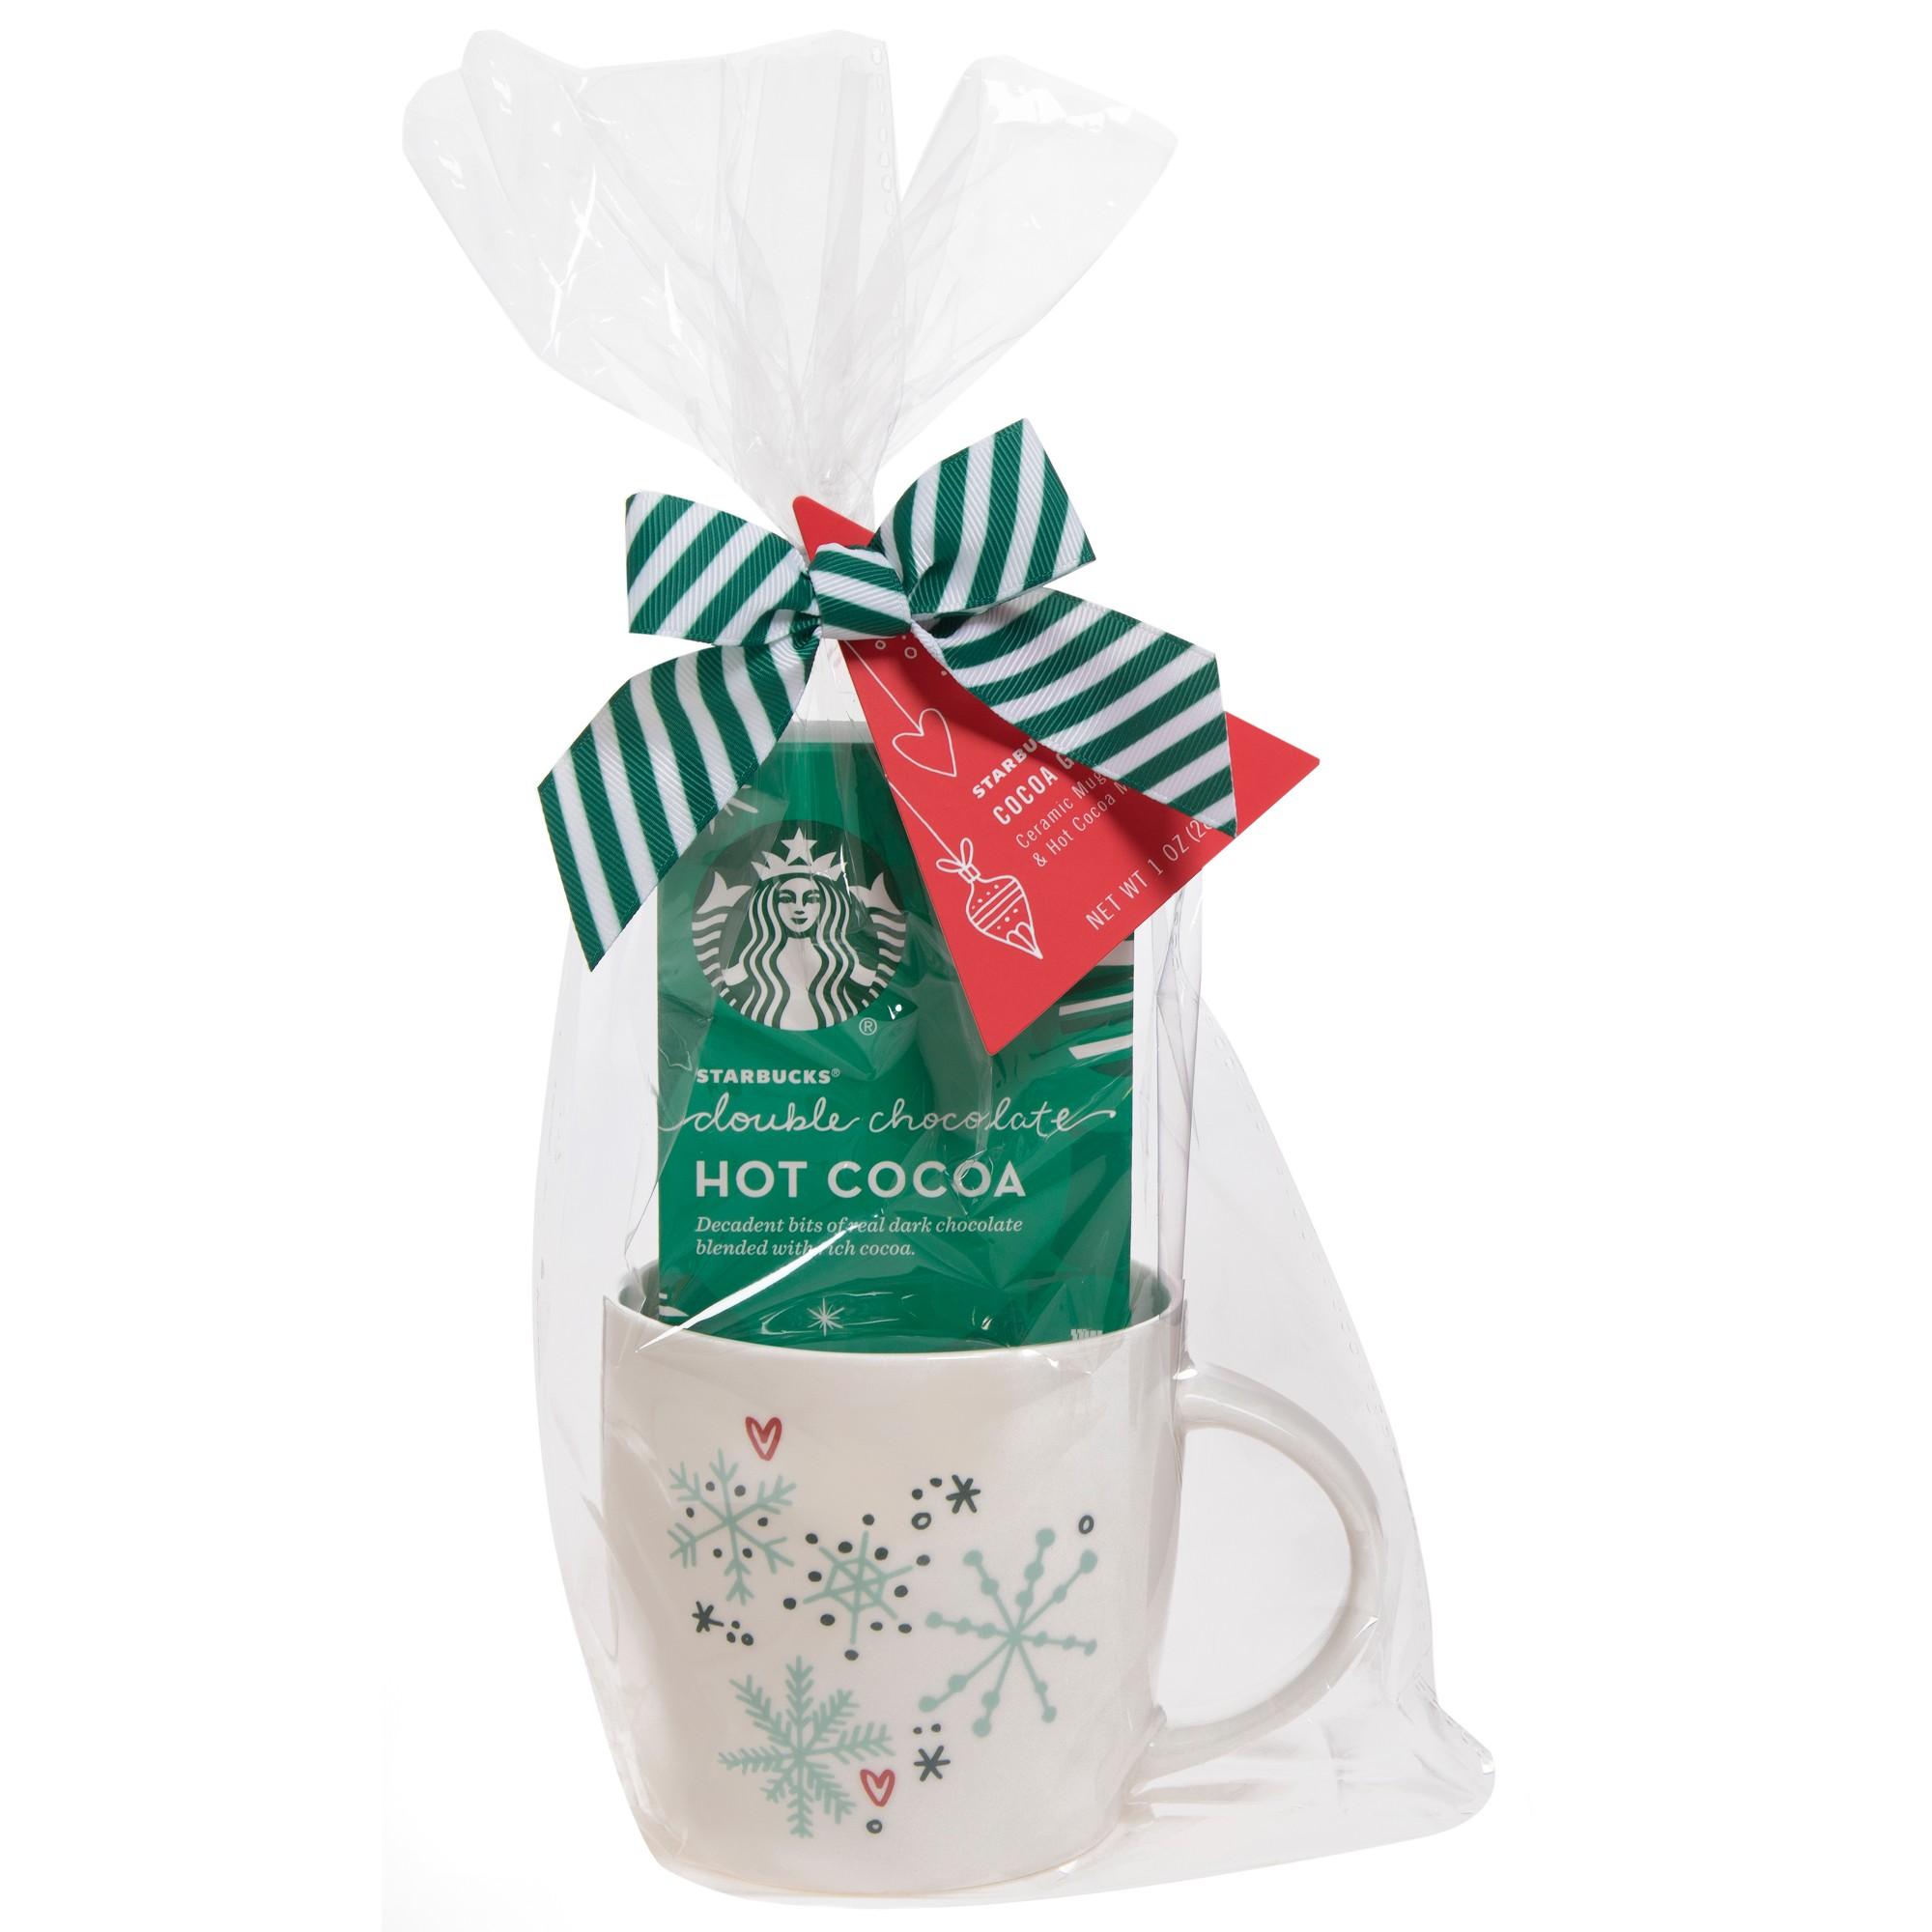 Starbucks Double Chocolate Hot Cocoa And Mug Gift Set 1oz